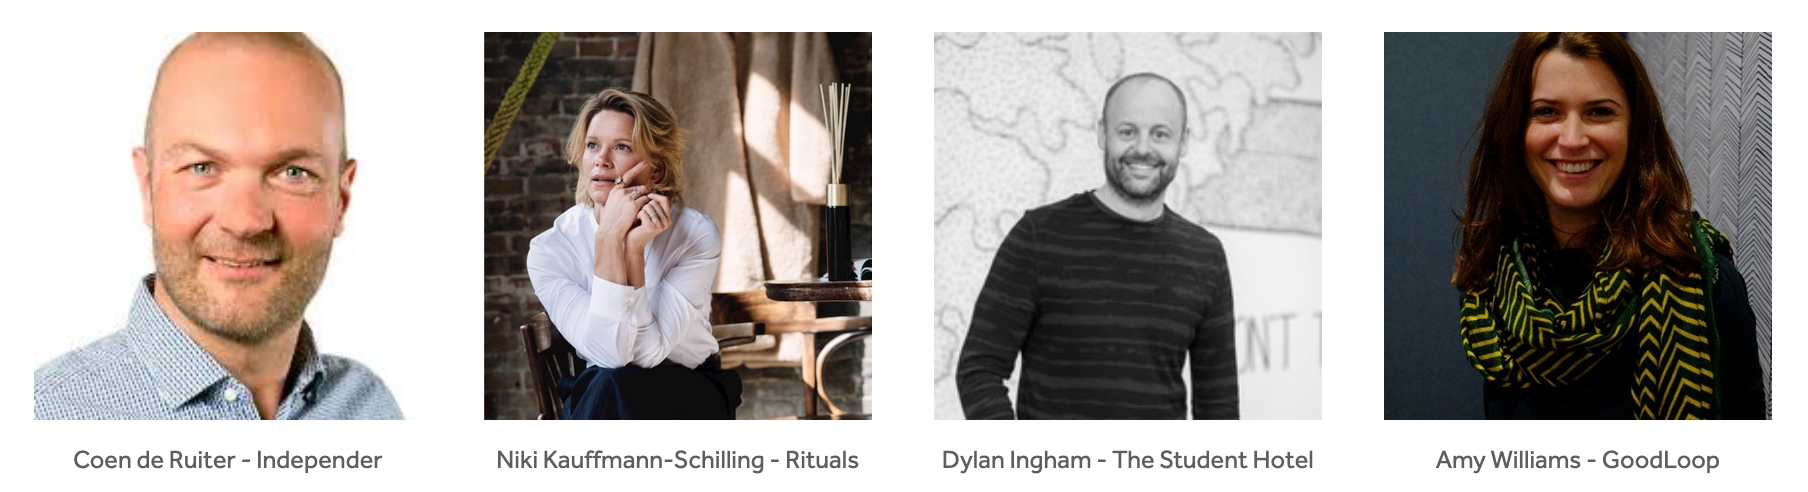 Coen de Ruiter - Independer, Niki Kauffmann-Schilling - Rituals, Dylan Ingham - The Student Hotel, Amy Williams - GoodLoop